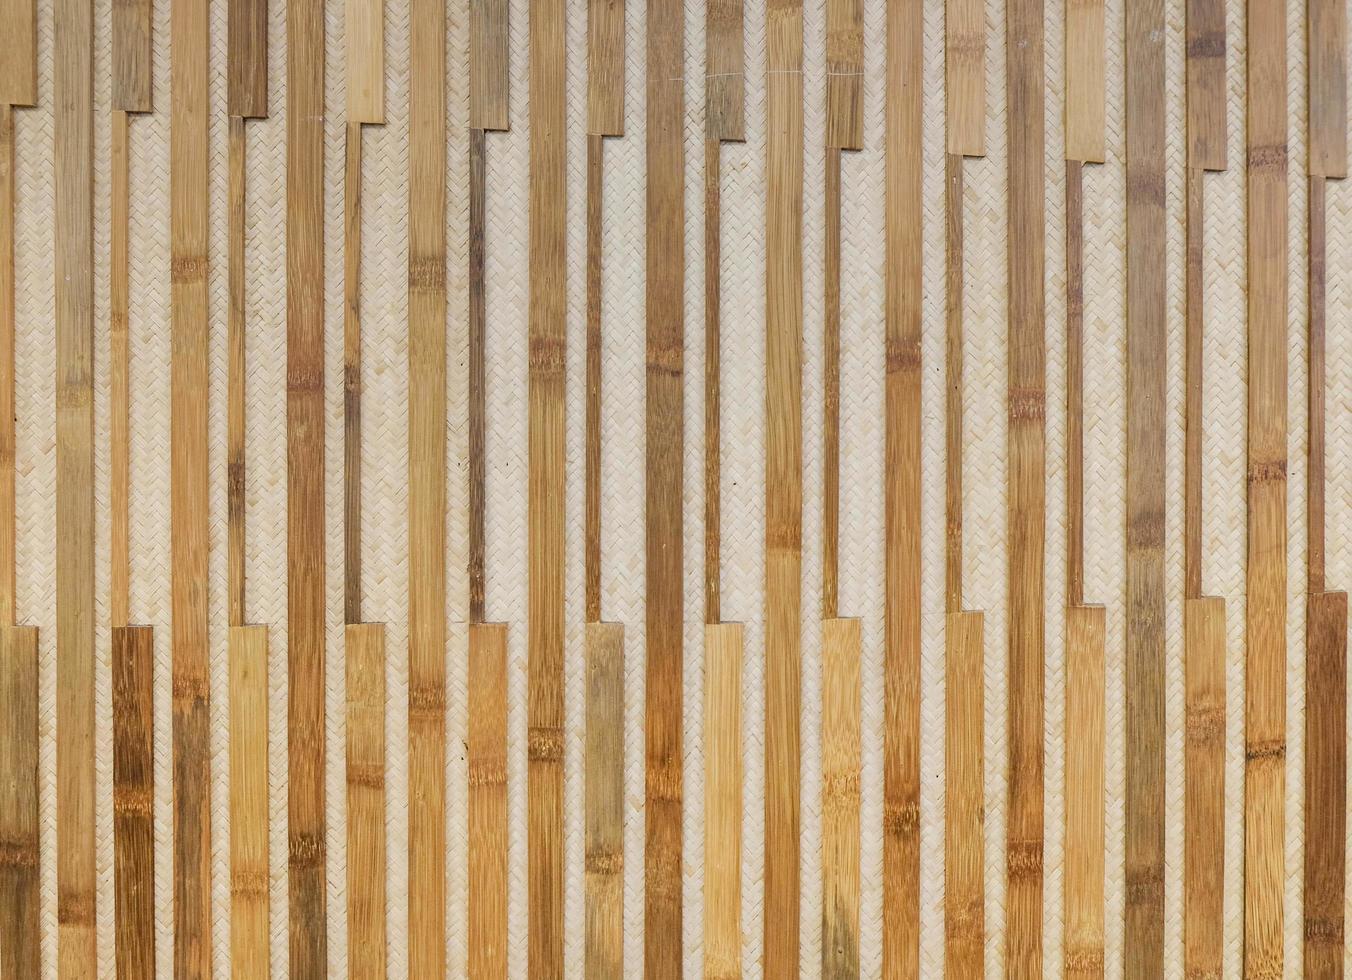 alte braune Bambusplanke foto